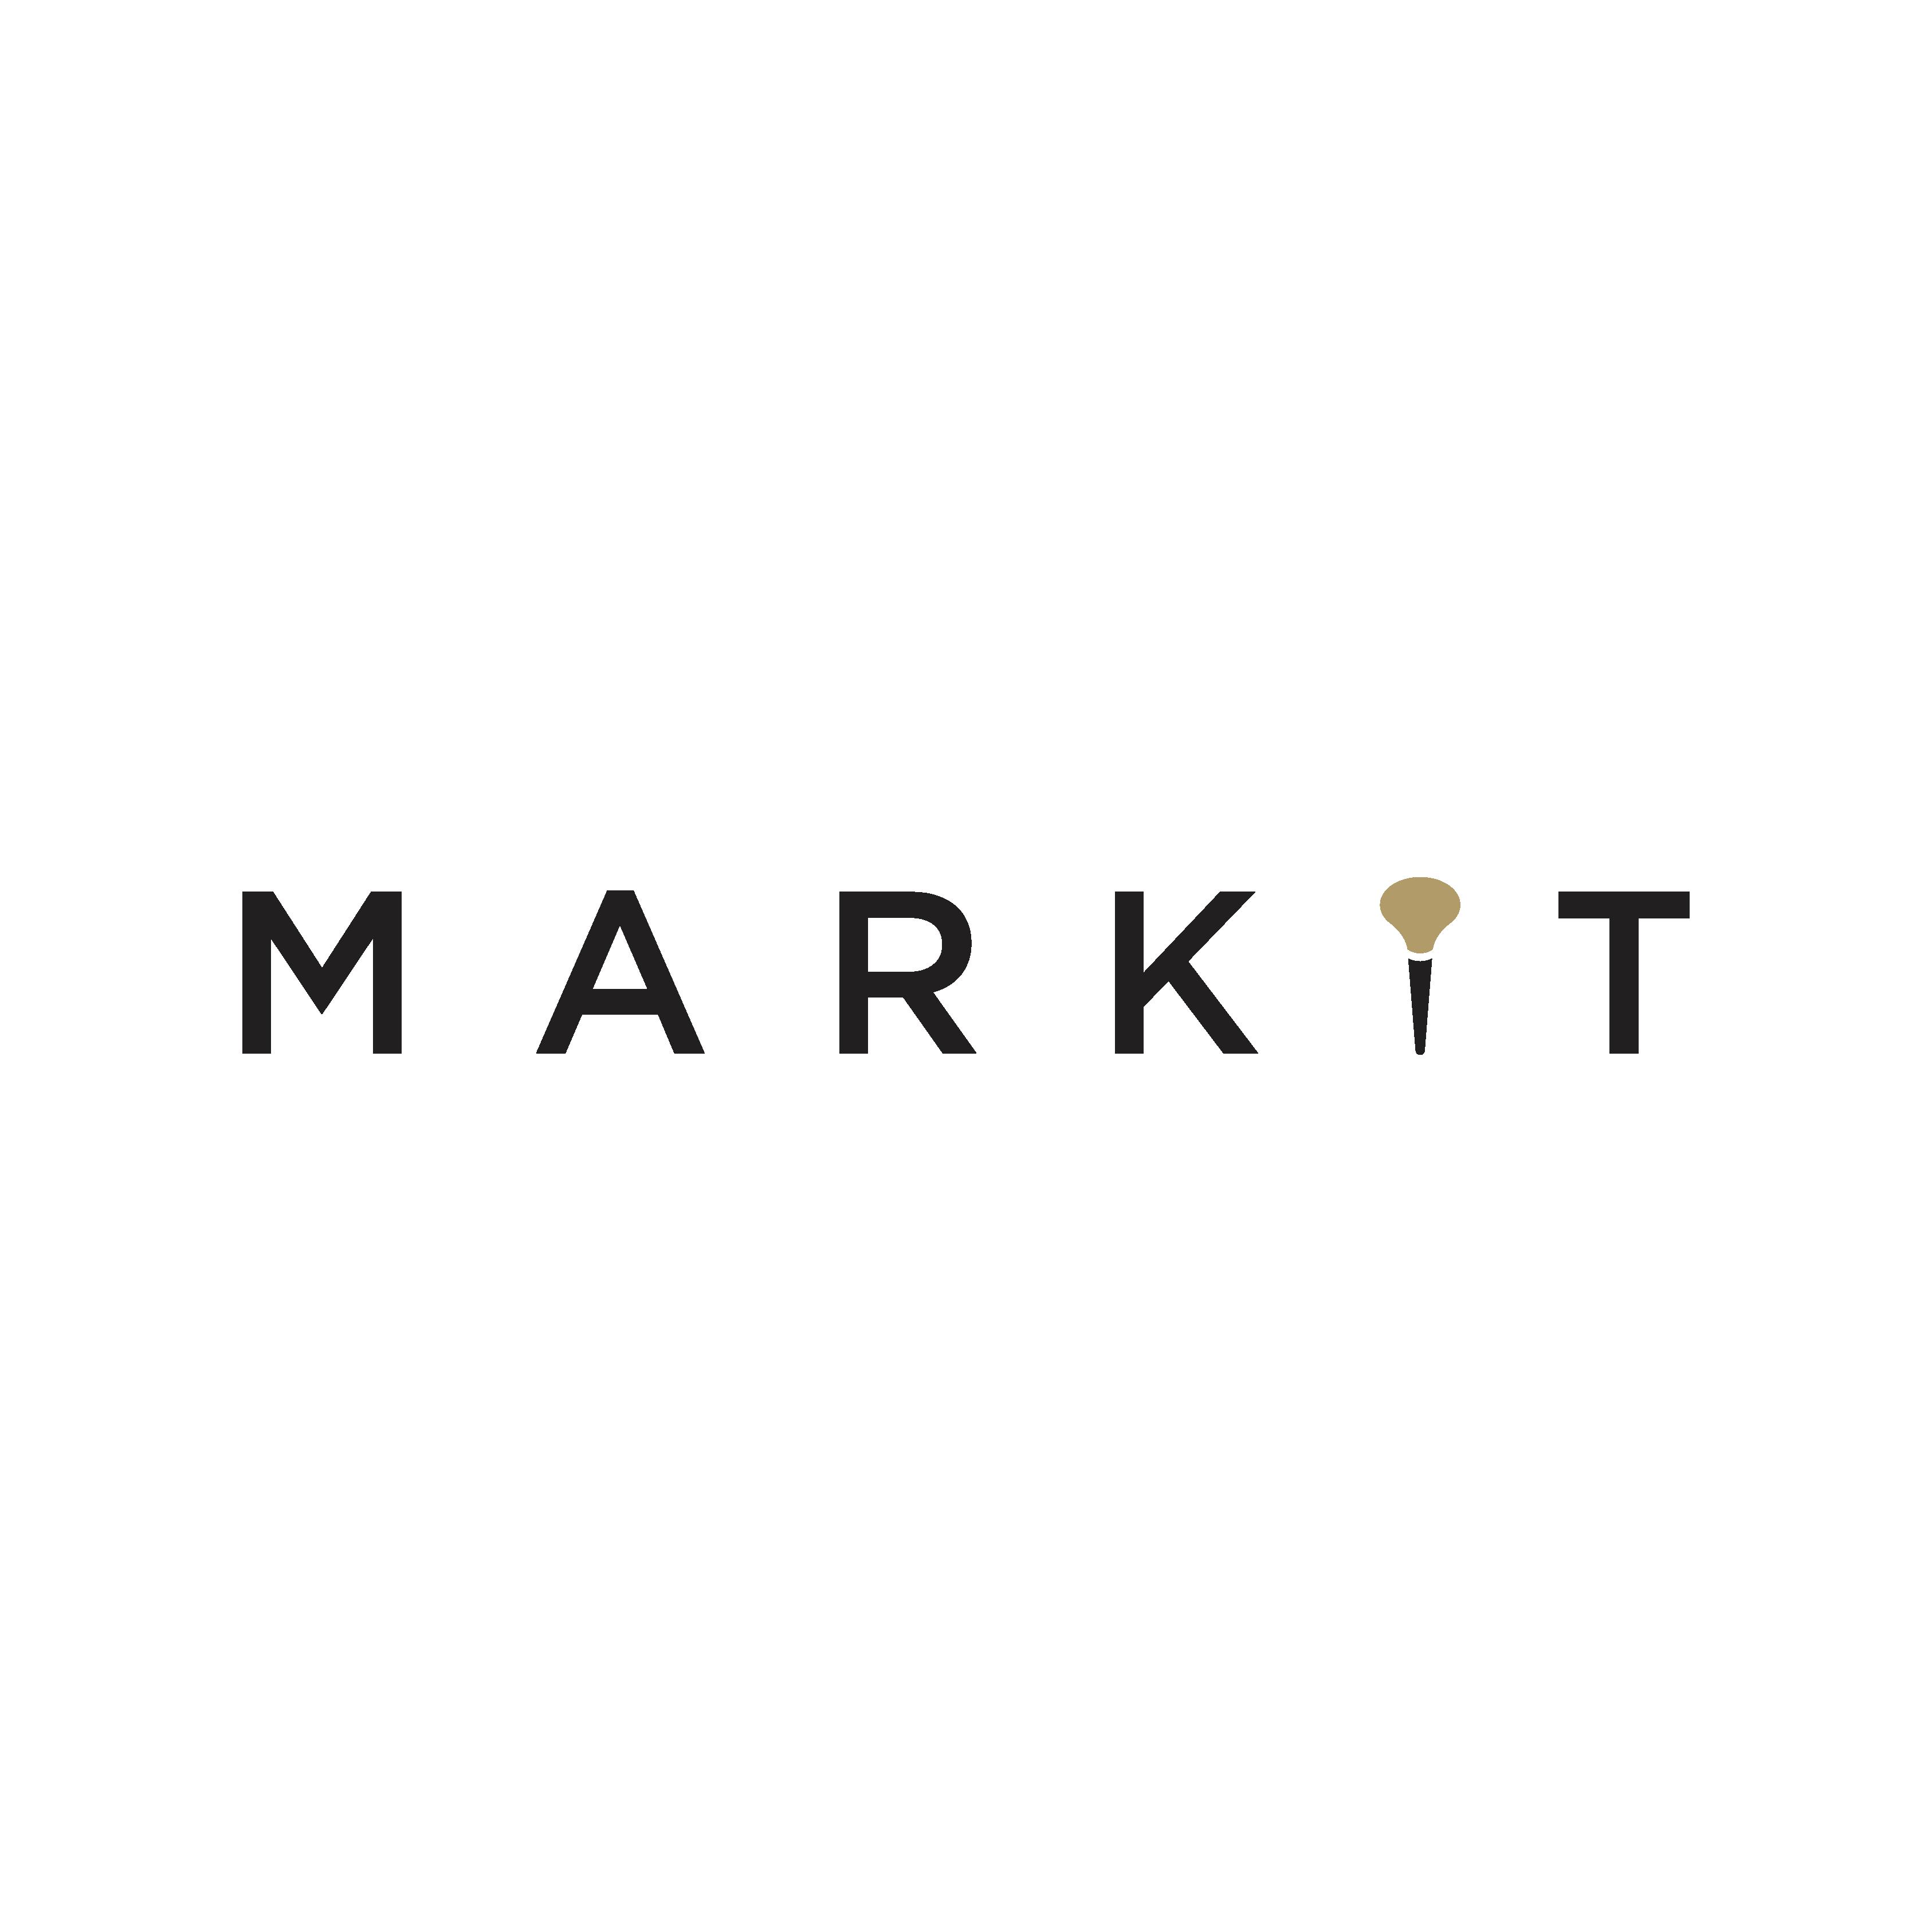 Markit是Swingvy雲端人資系統的客戶